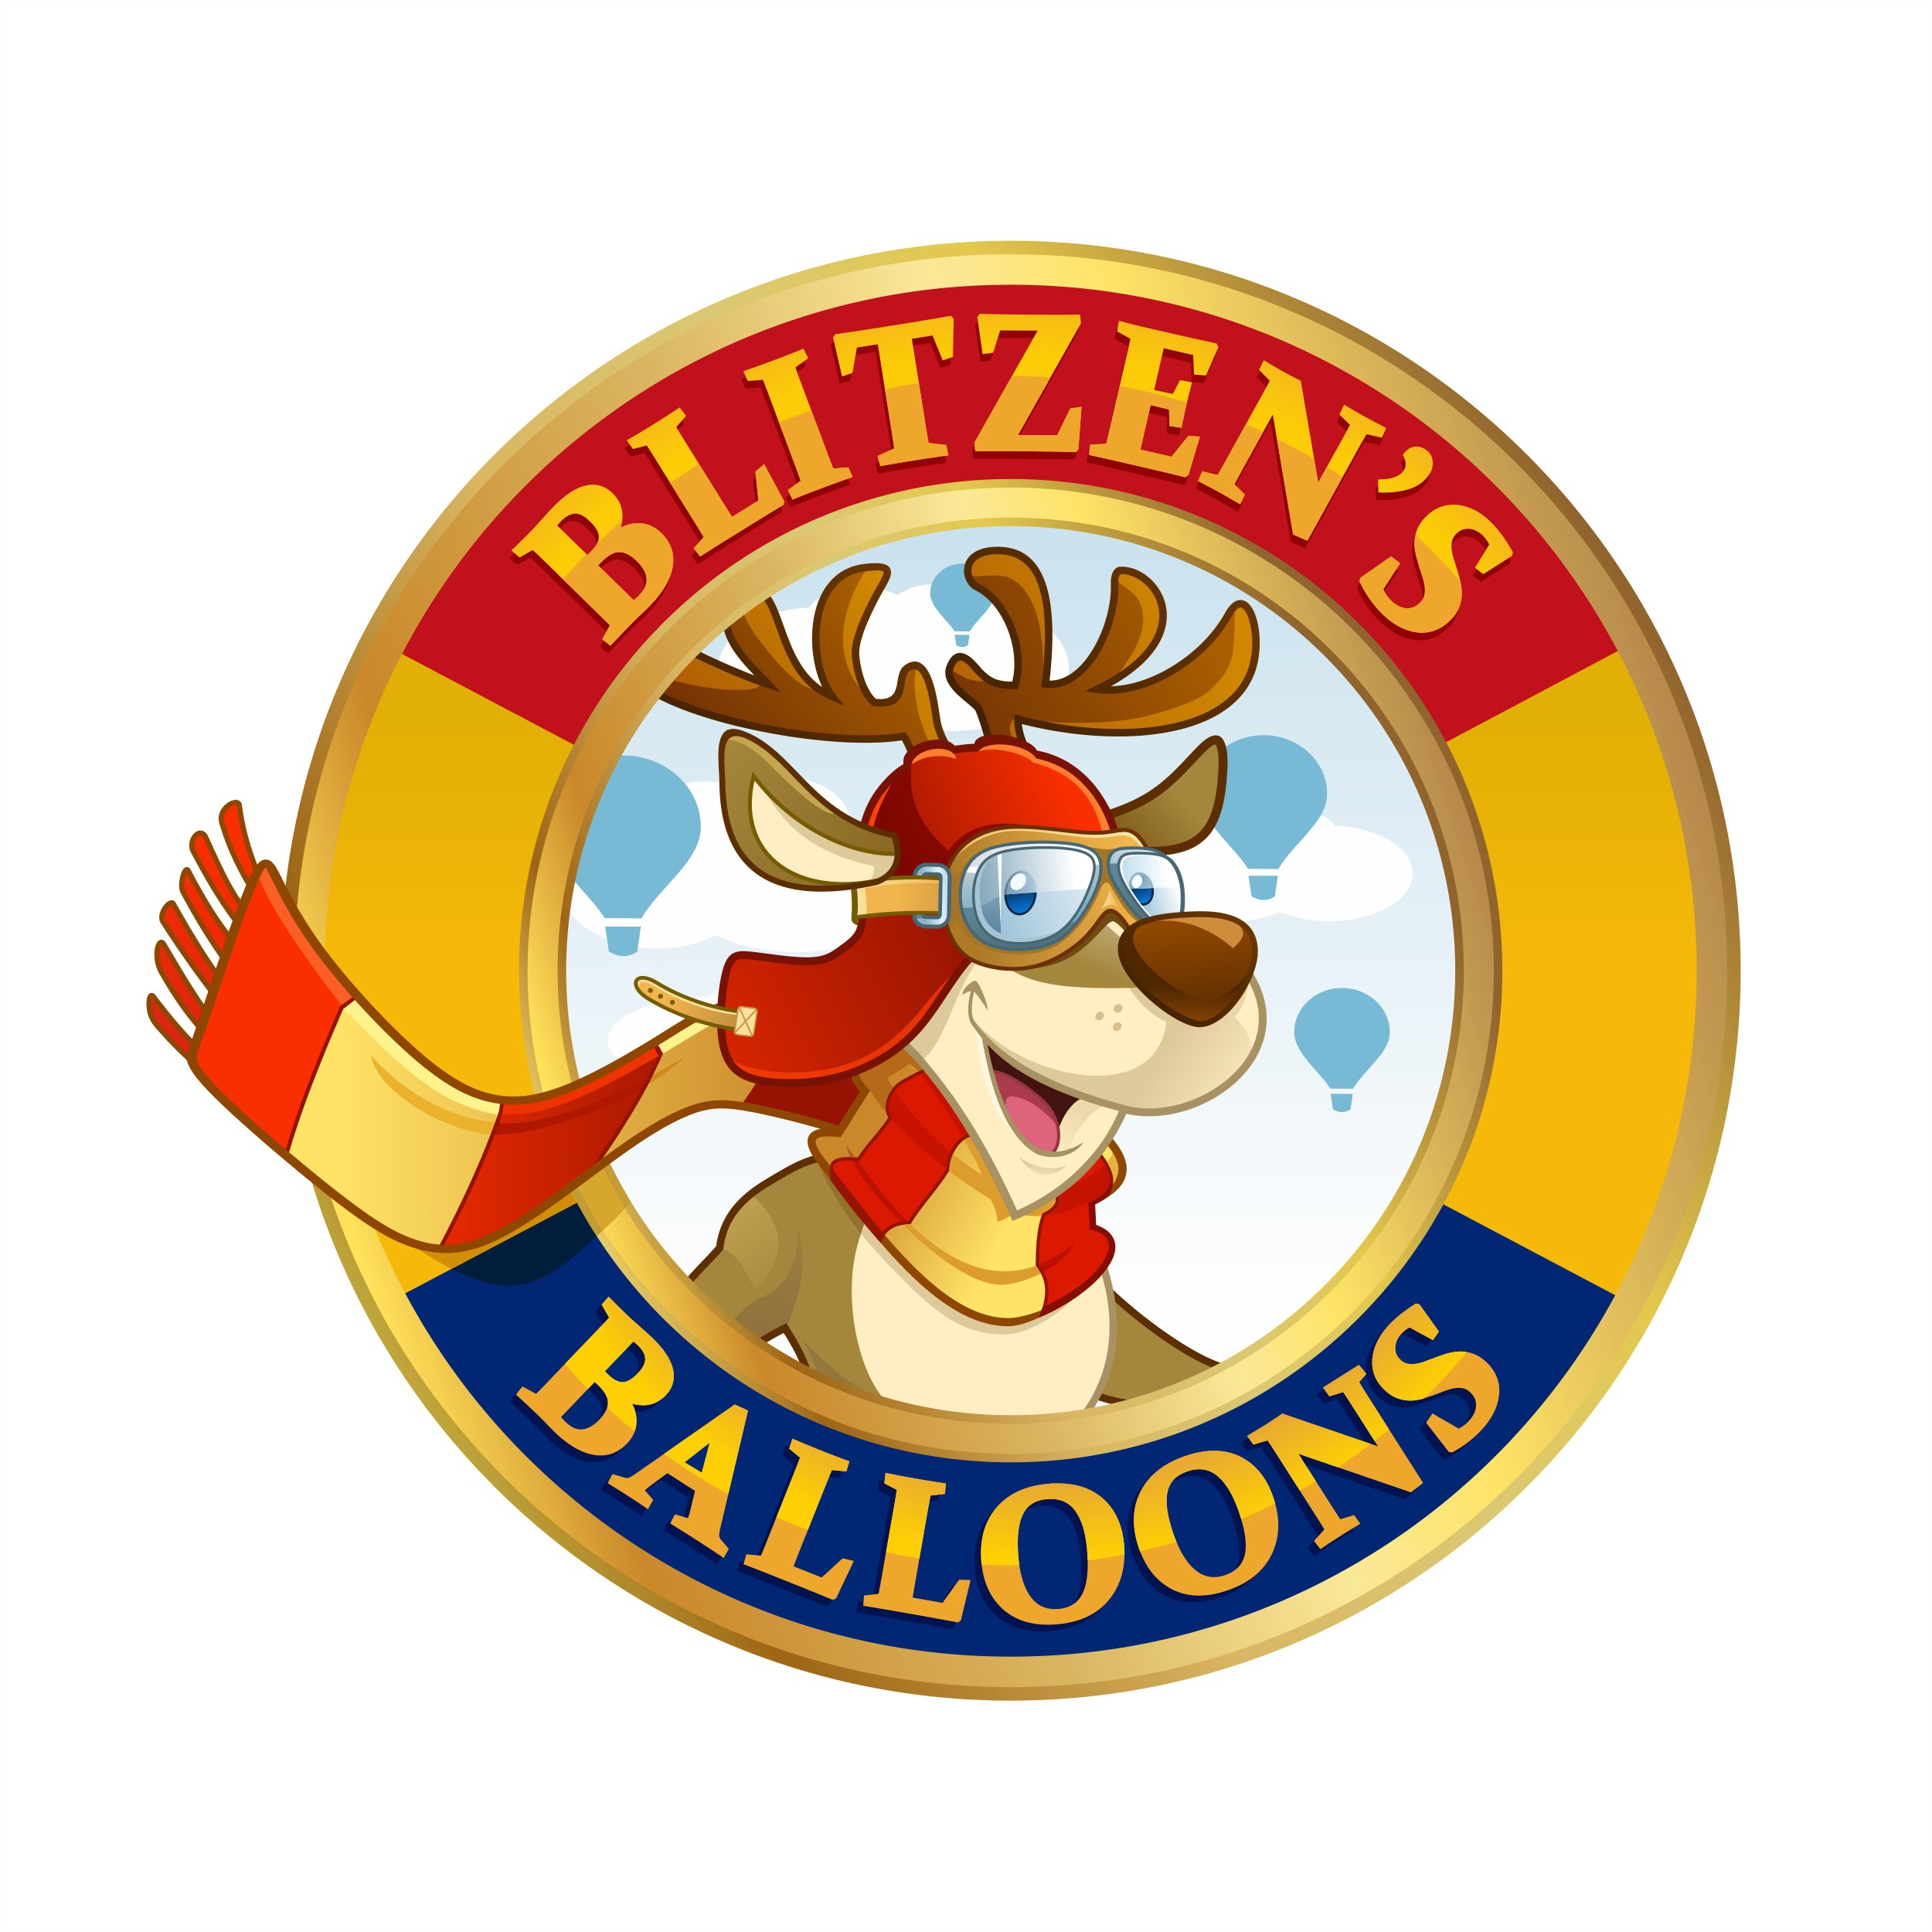 Blitzen's Balloons